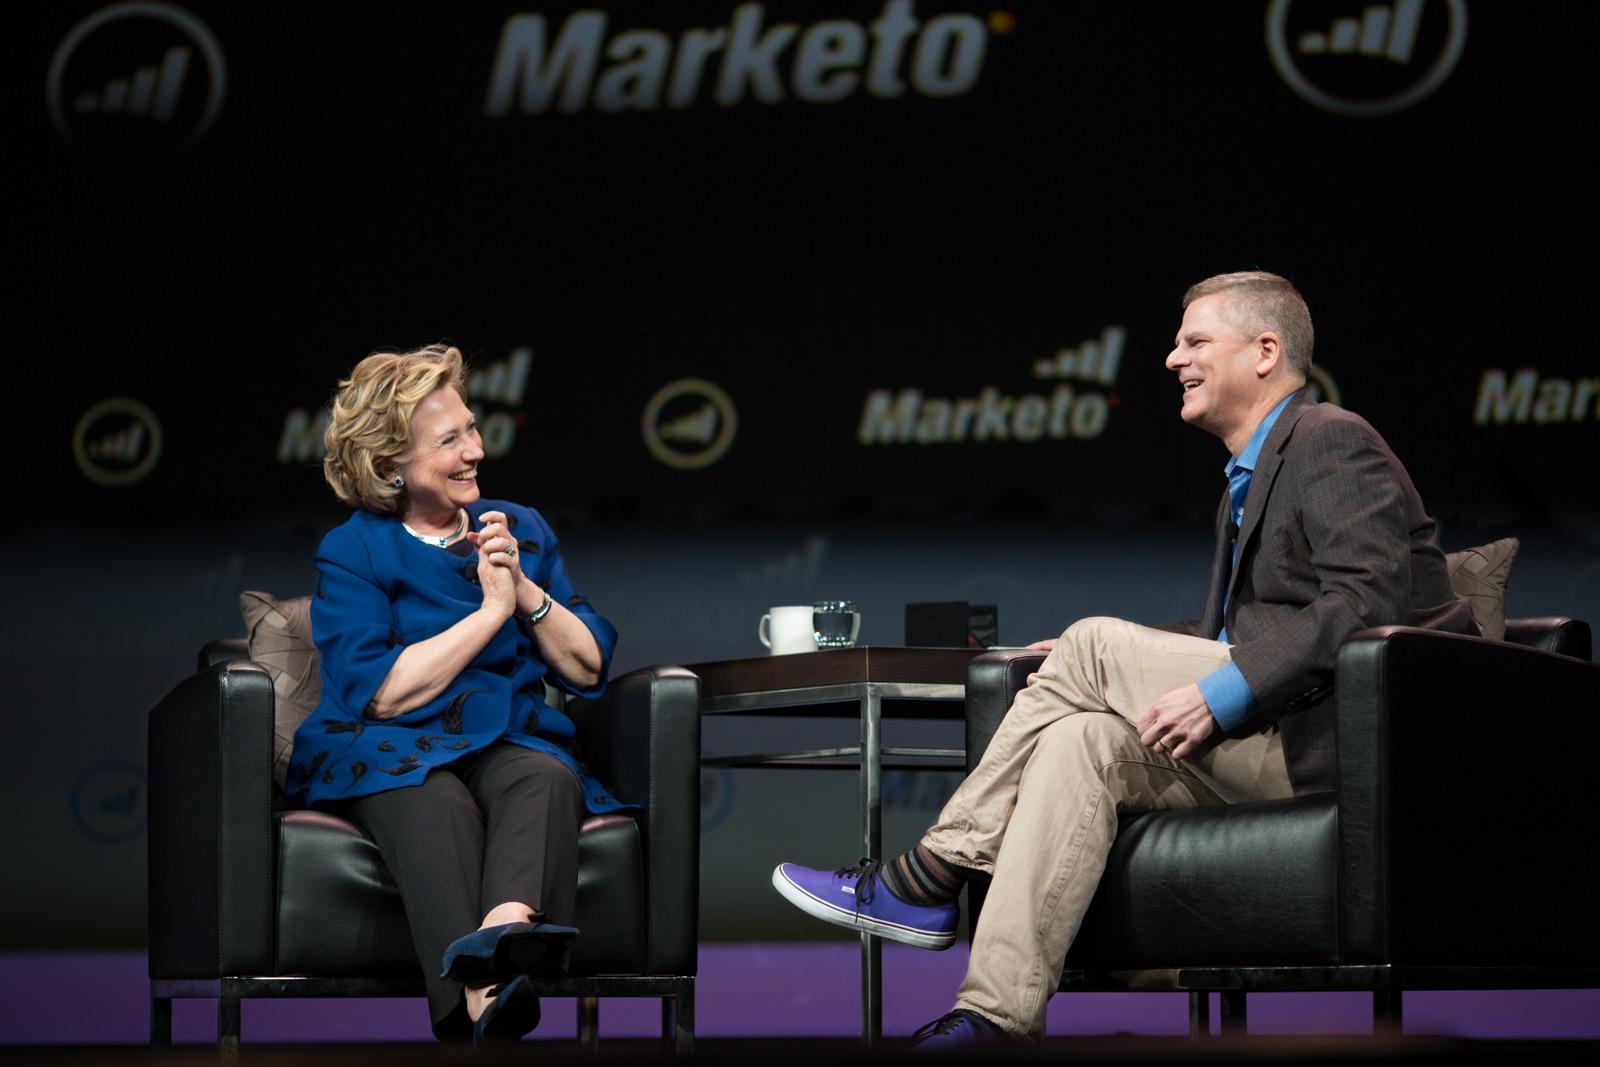 Keynote with Hillary Clinton